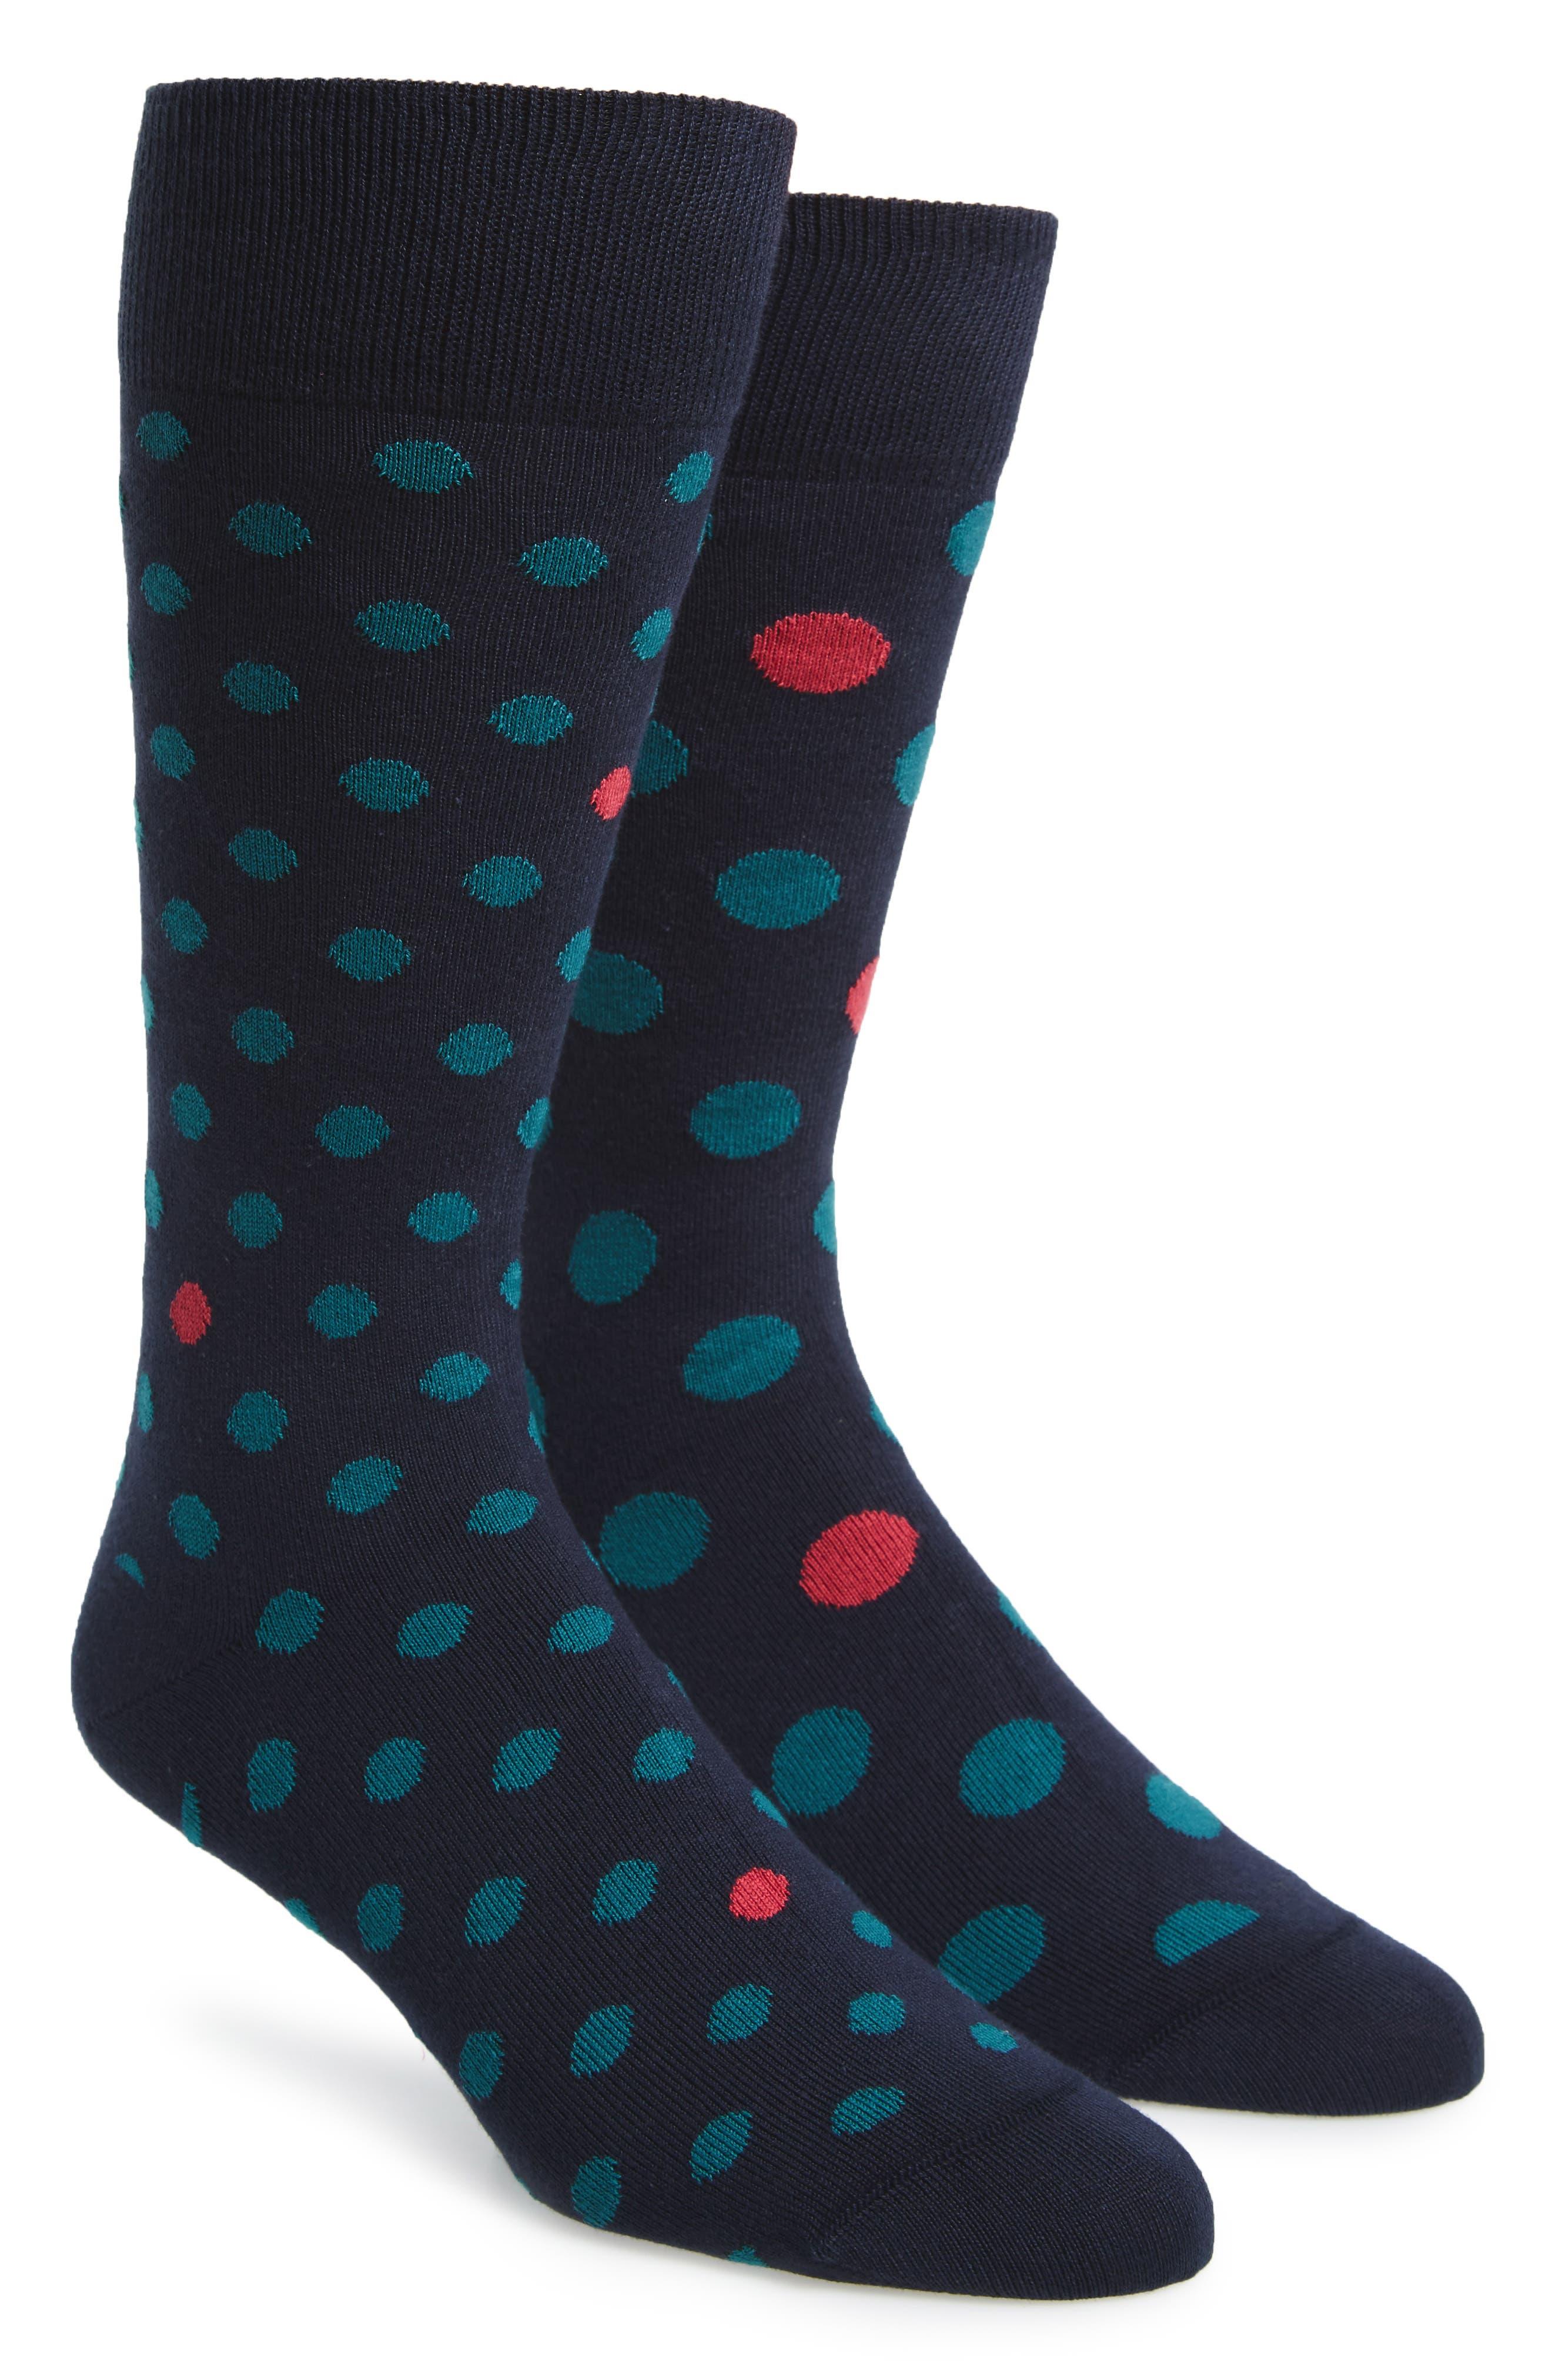 Odd Polka Dot Socks,                             Main thumbnail 2, color,